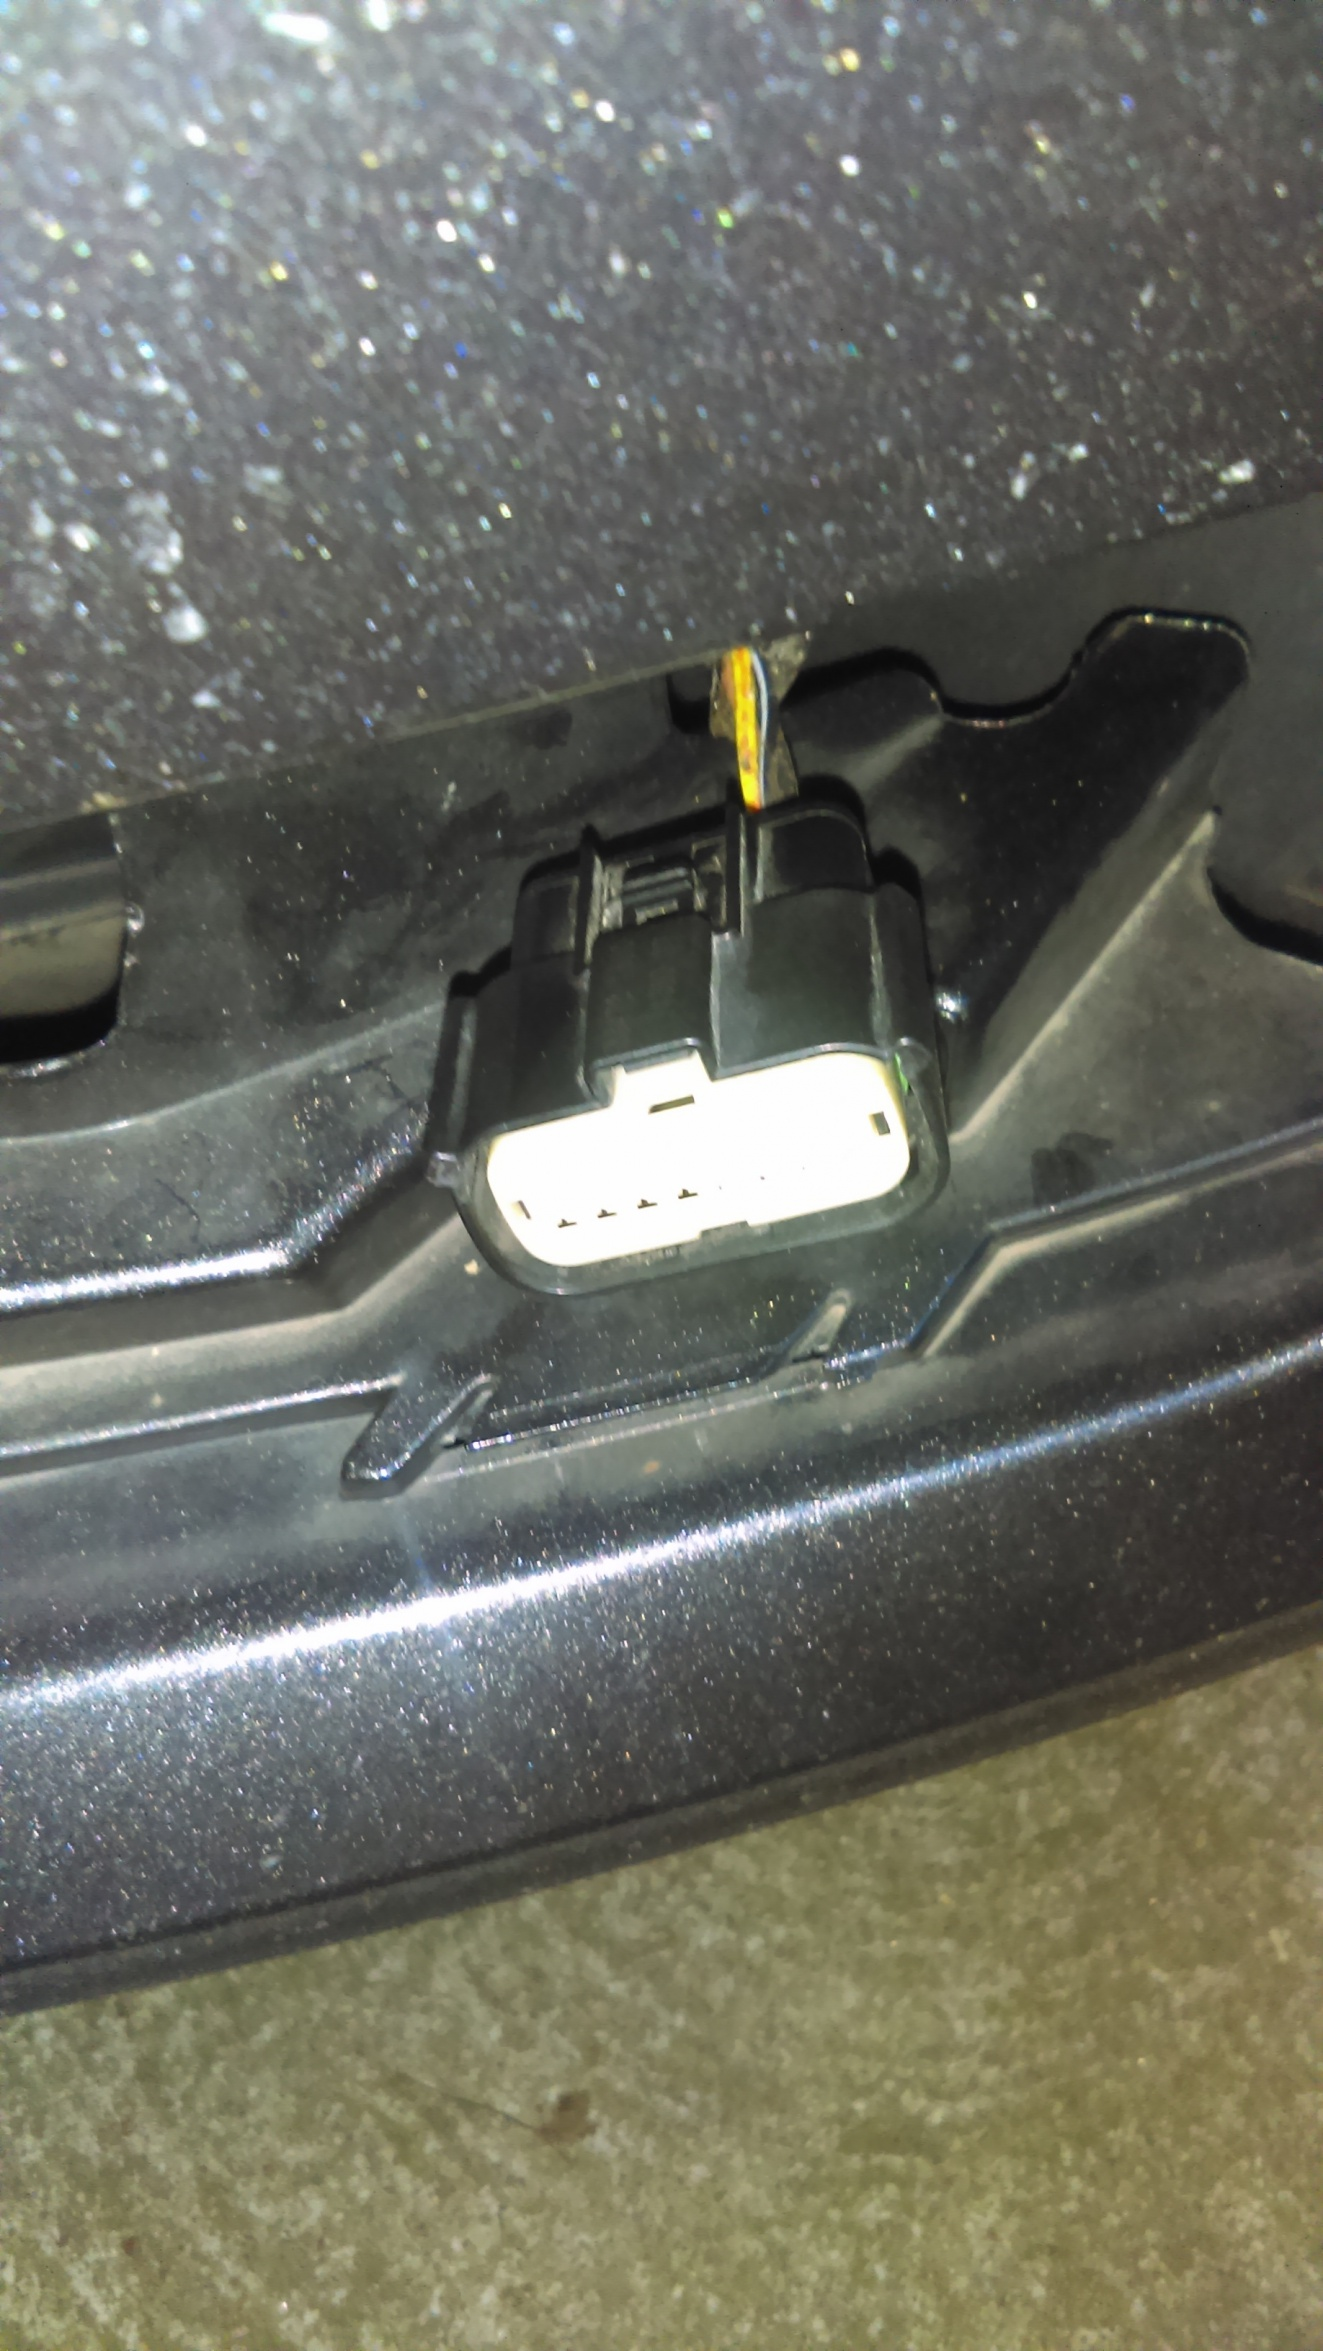 2015 ford focus se fog light connector?-imag0244%5b1%5d jpg